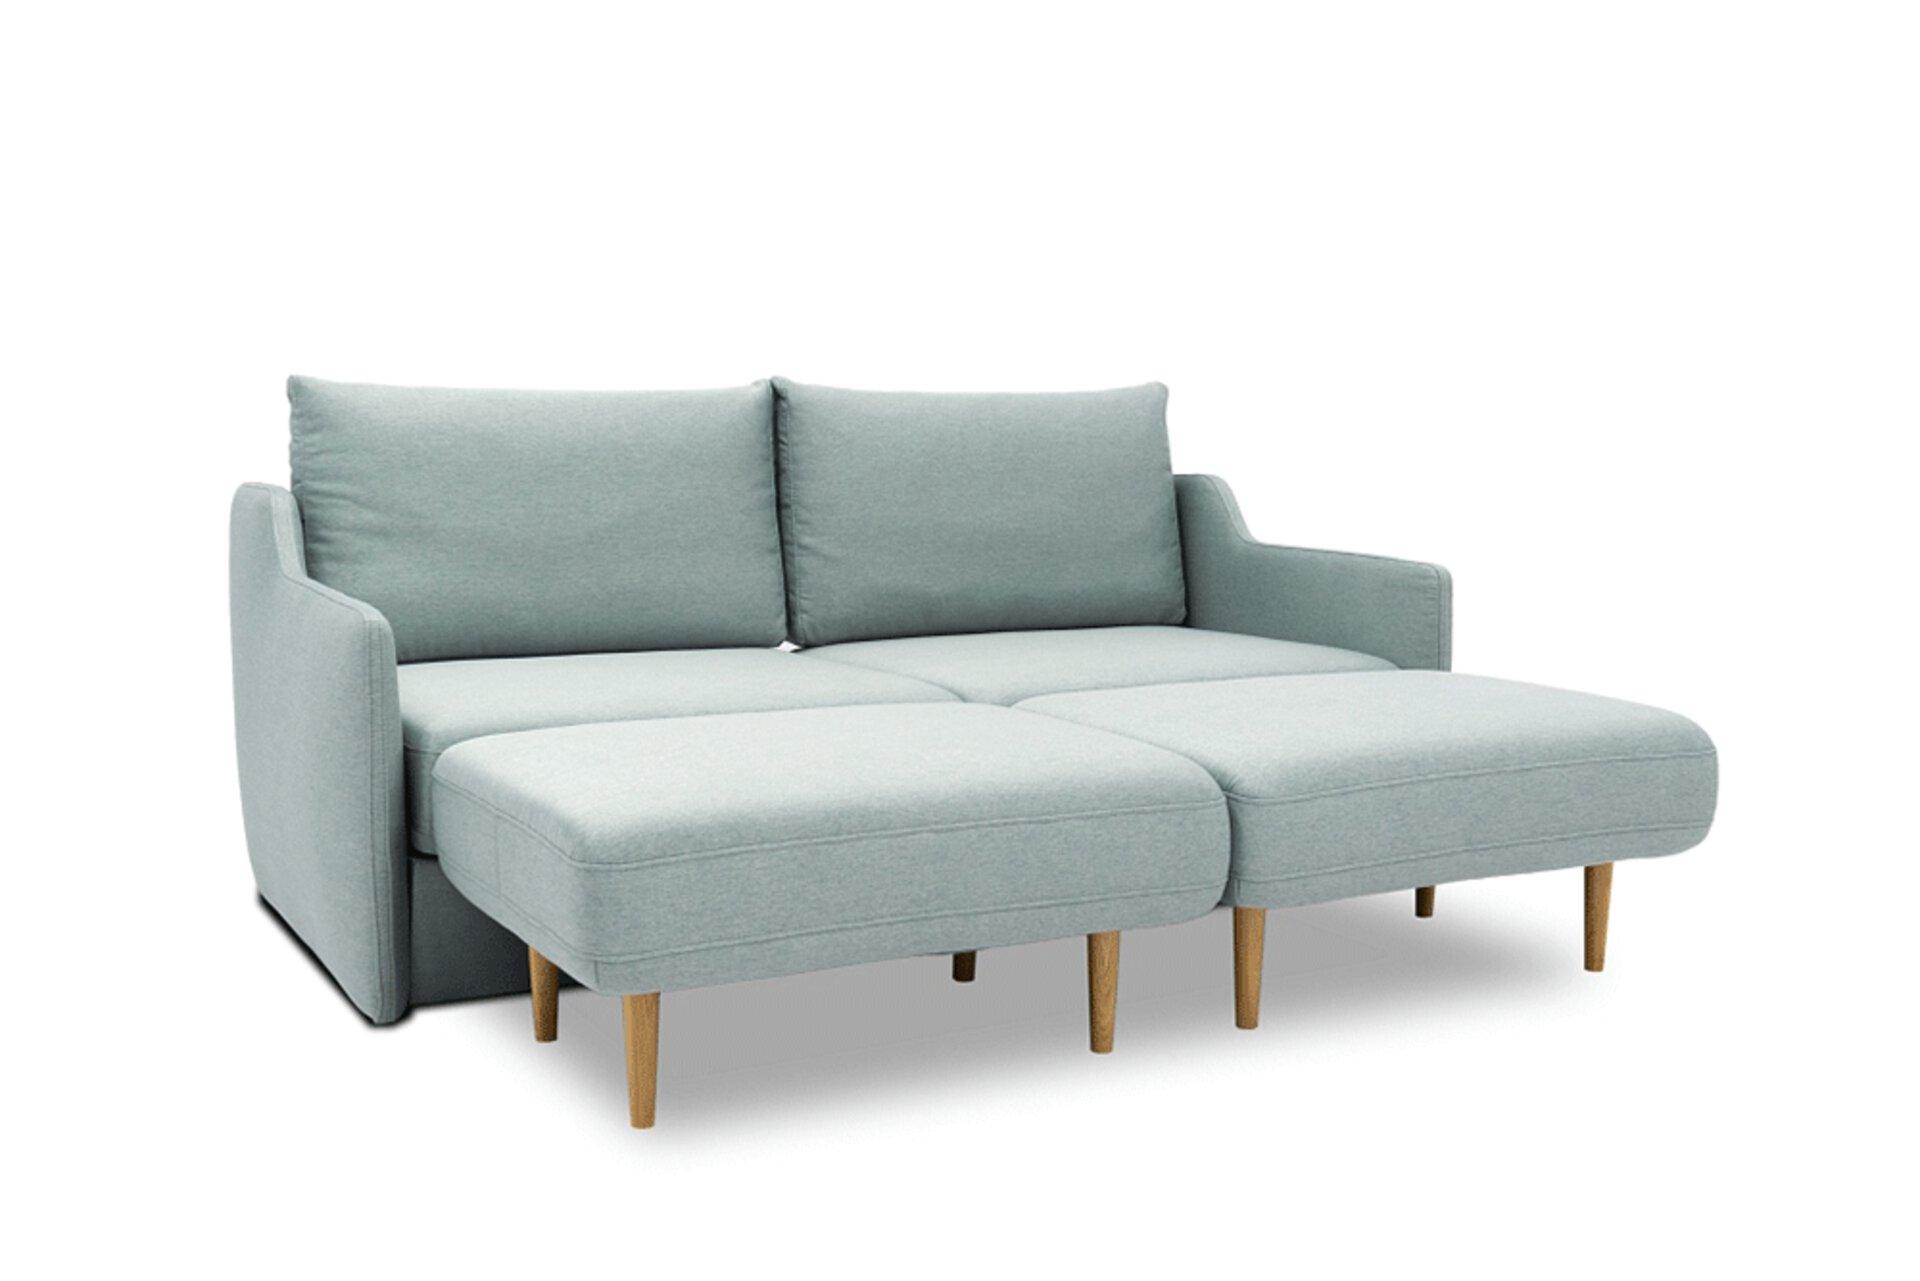 Sofa 2-Sitzer ALFA tiny.collection Textil 96 x 107 x 198 cm